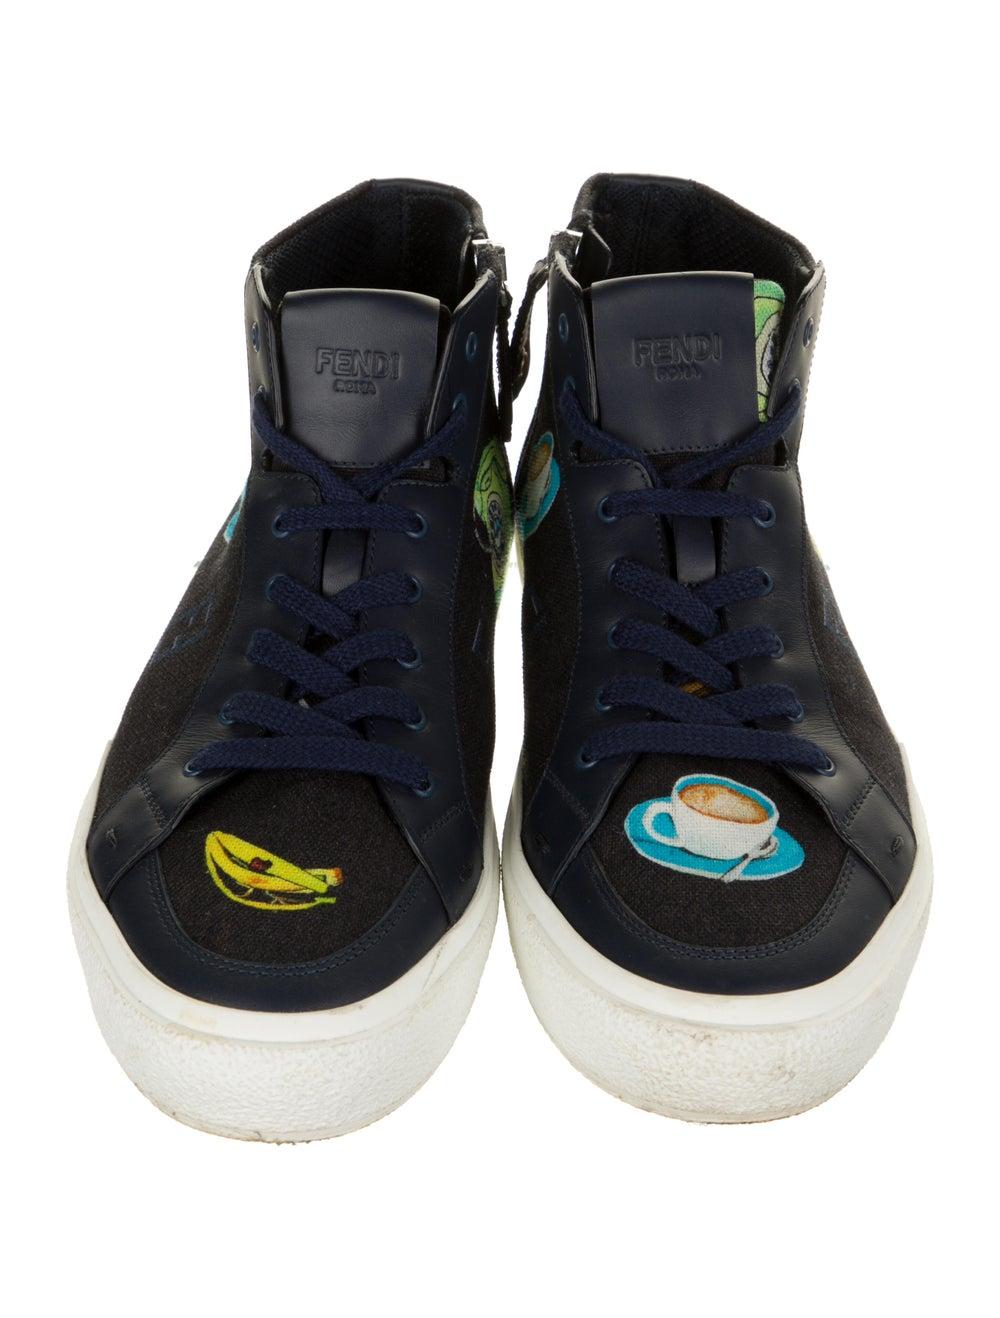 Fendi Graphic Print Sneakers Blue - image 3